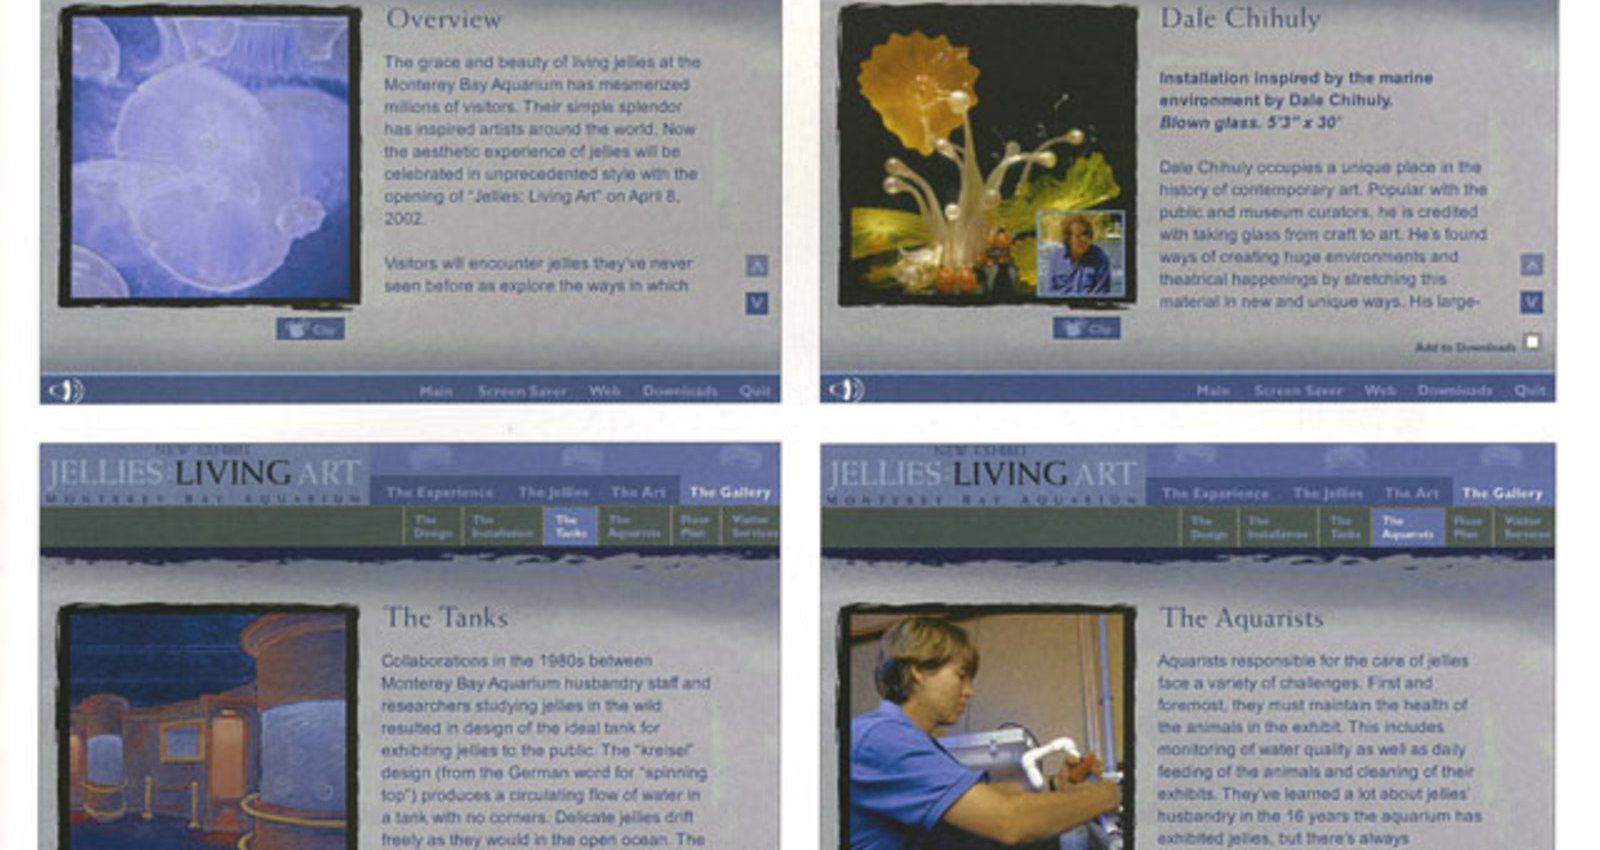 Jellies: Living Art CD-ROM Press Kit